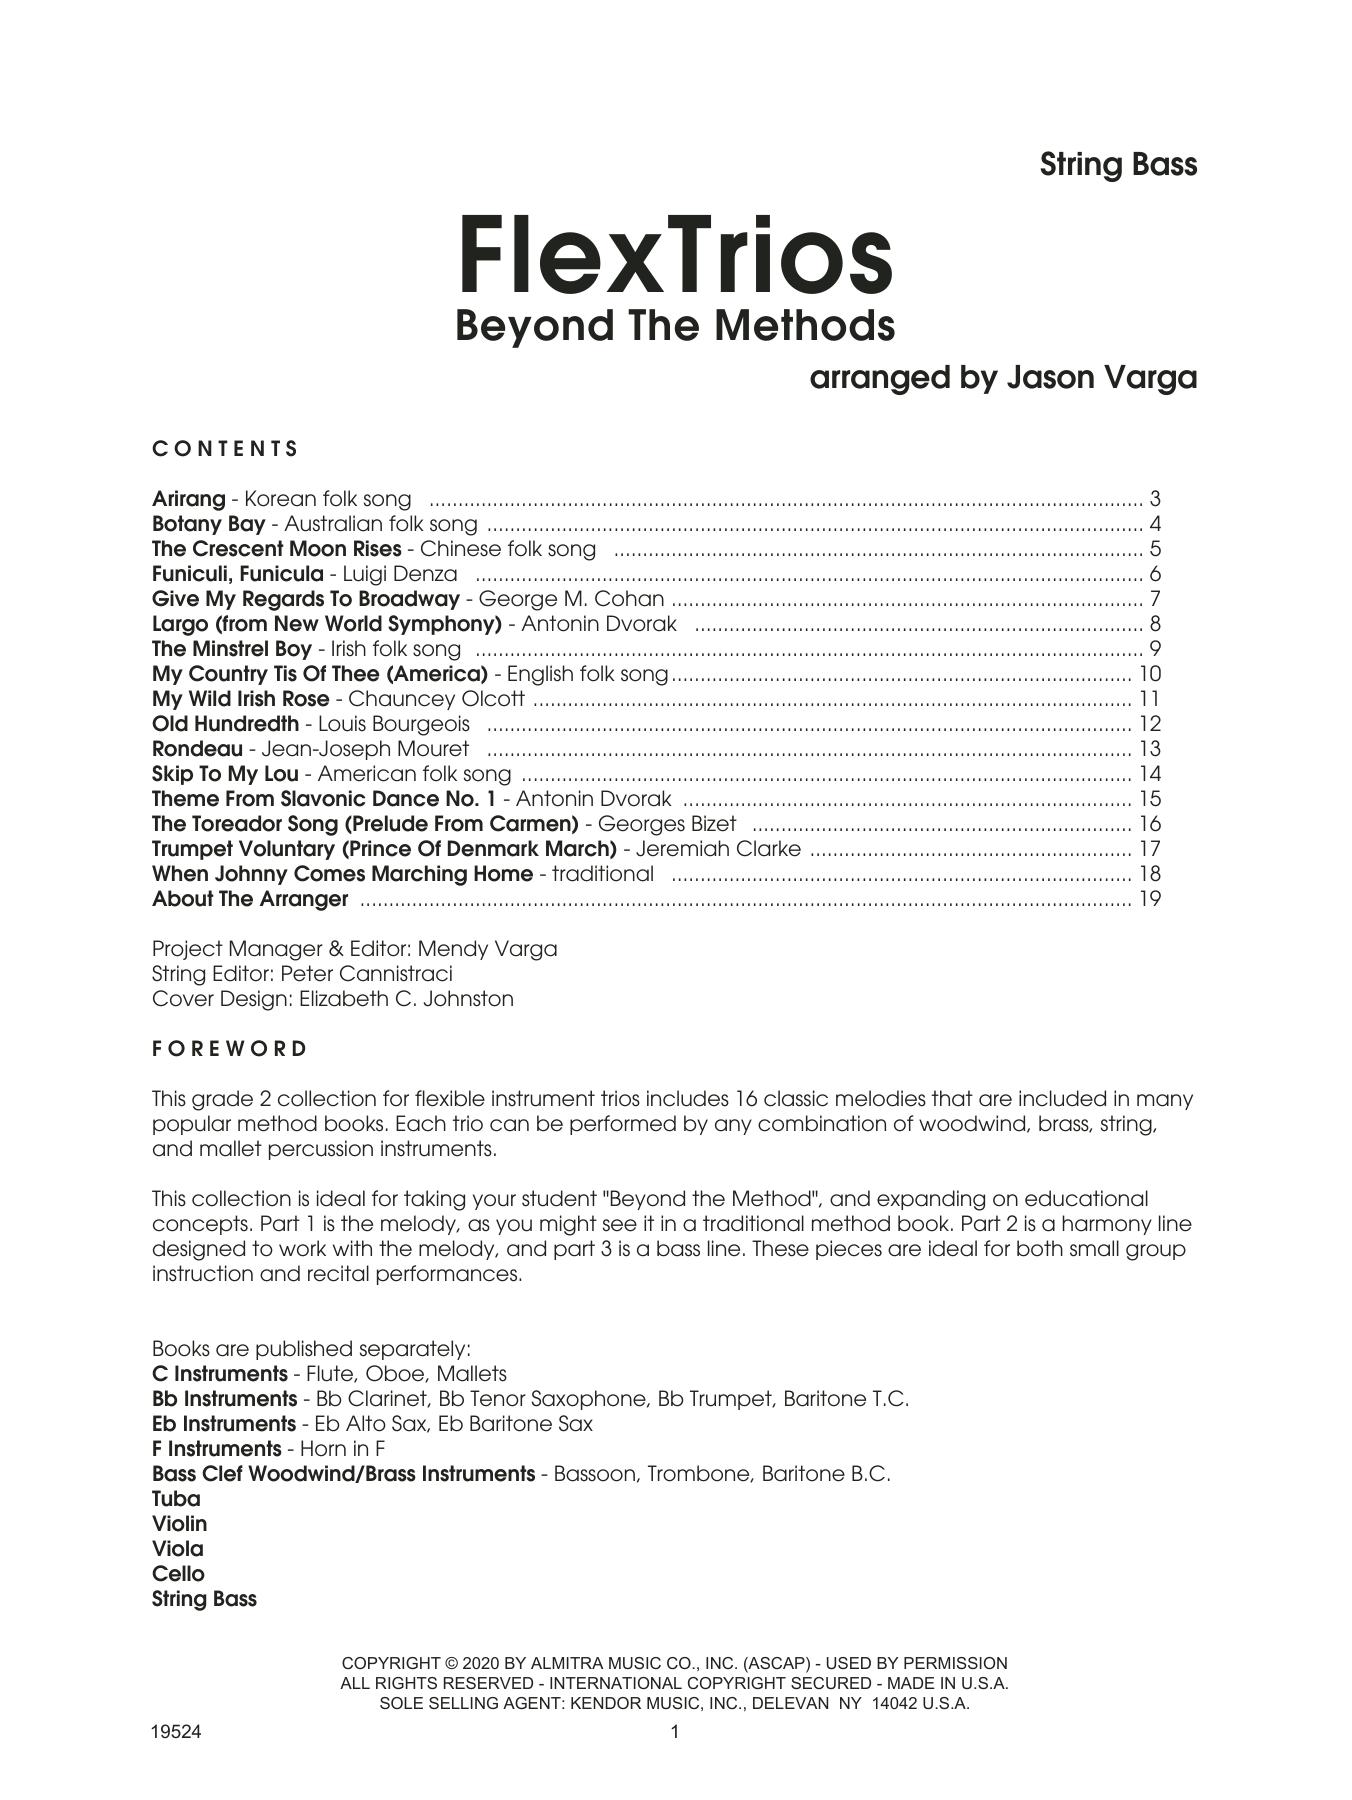 Jason Varga Flextrios - Beyond The Methods (16 Pieces) - String Bass sheet music notes printable PDF score